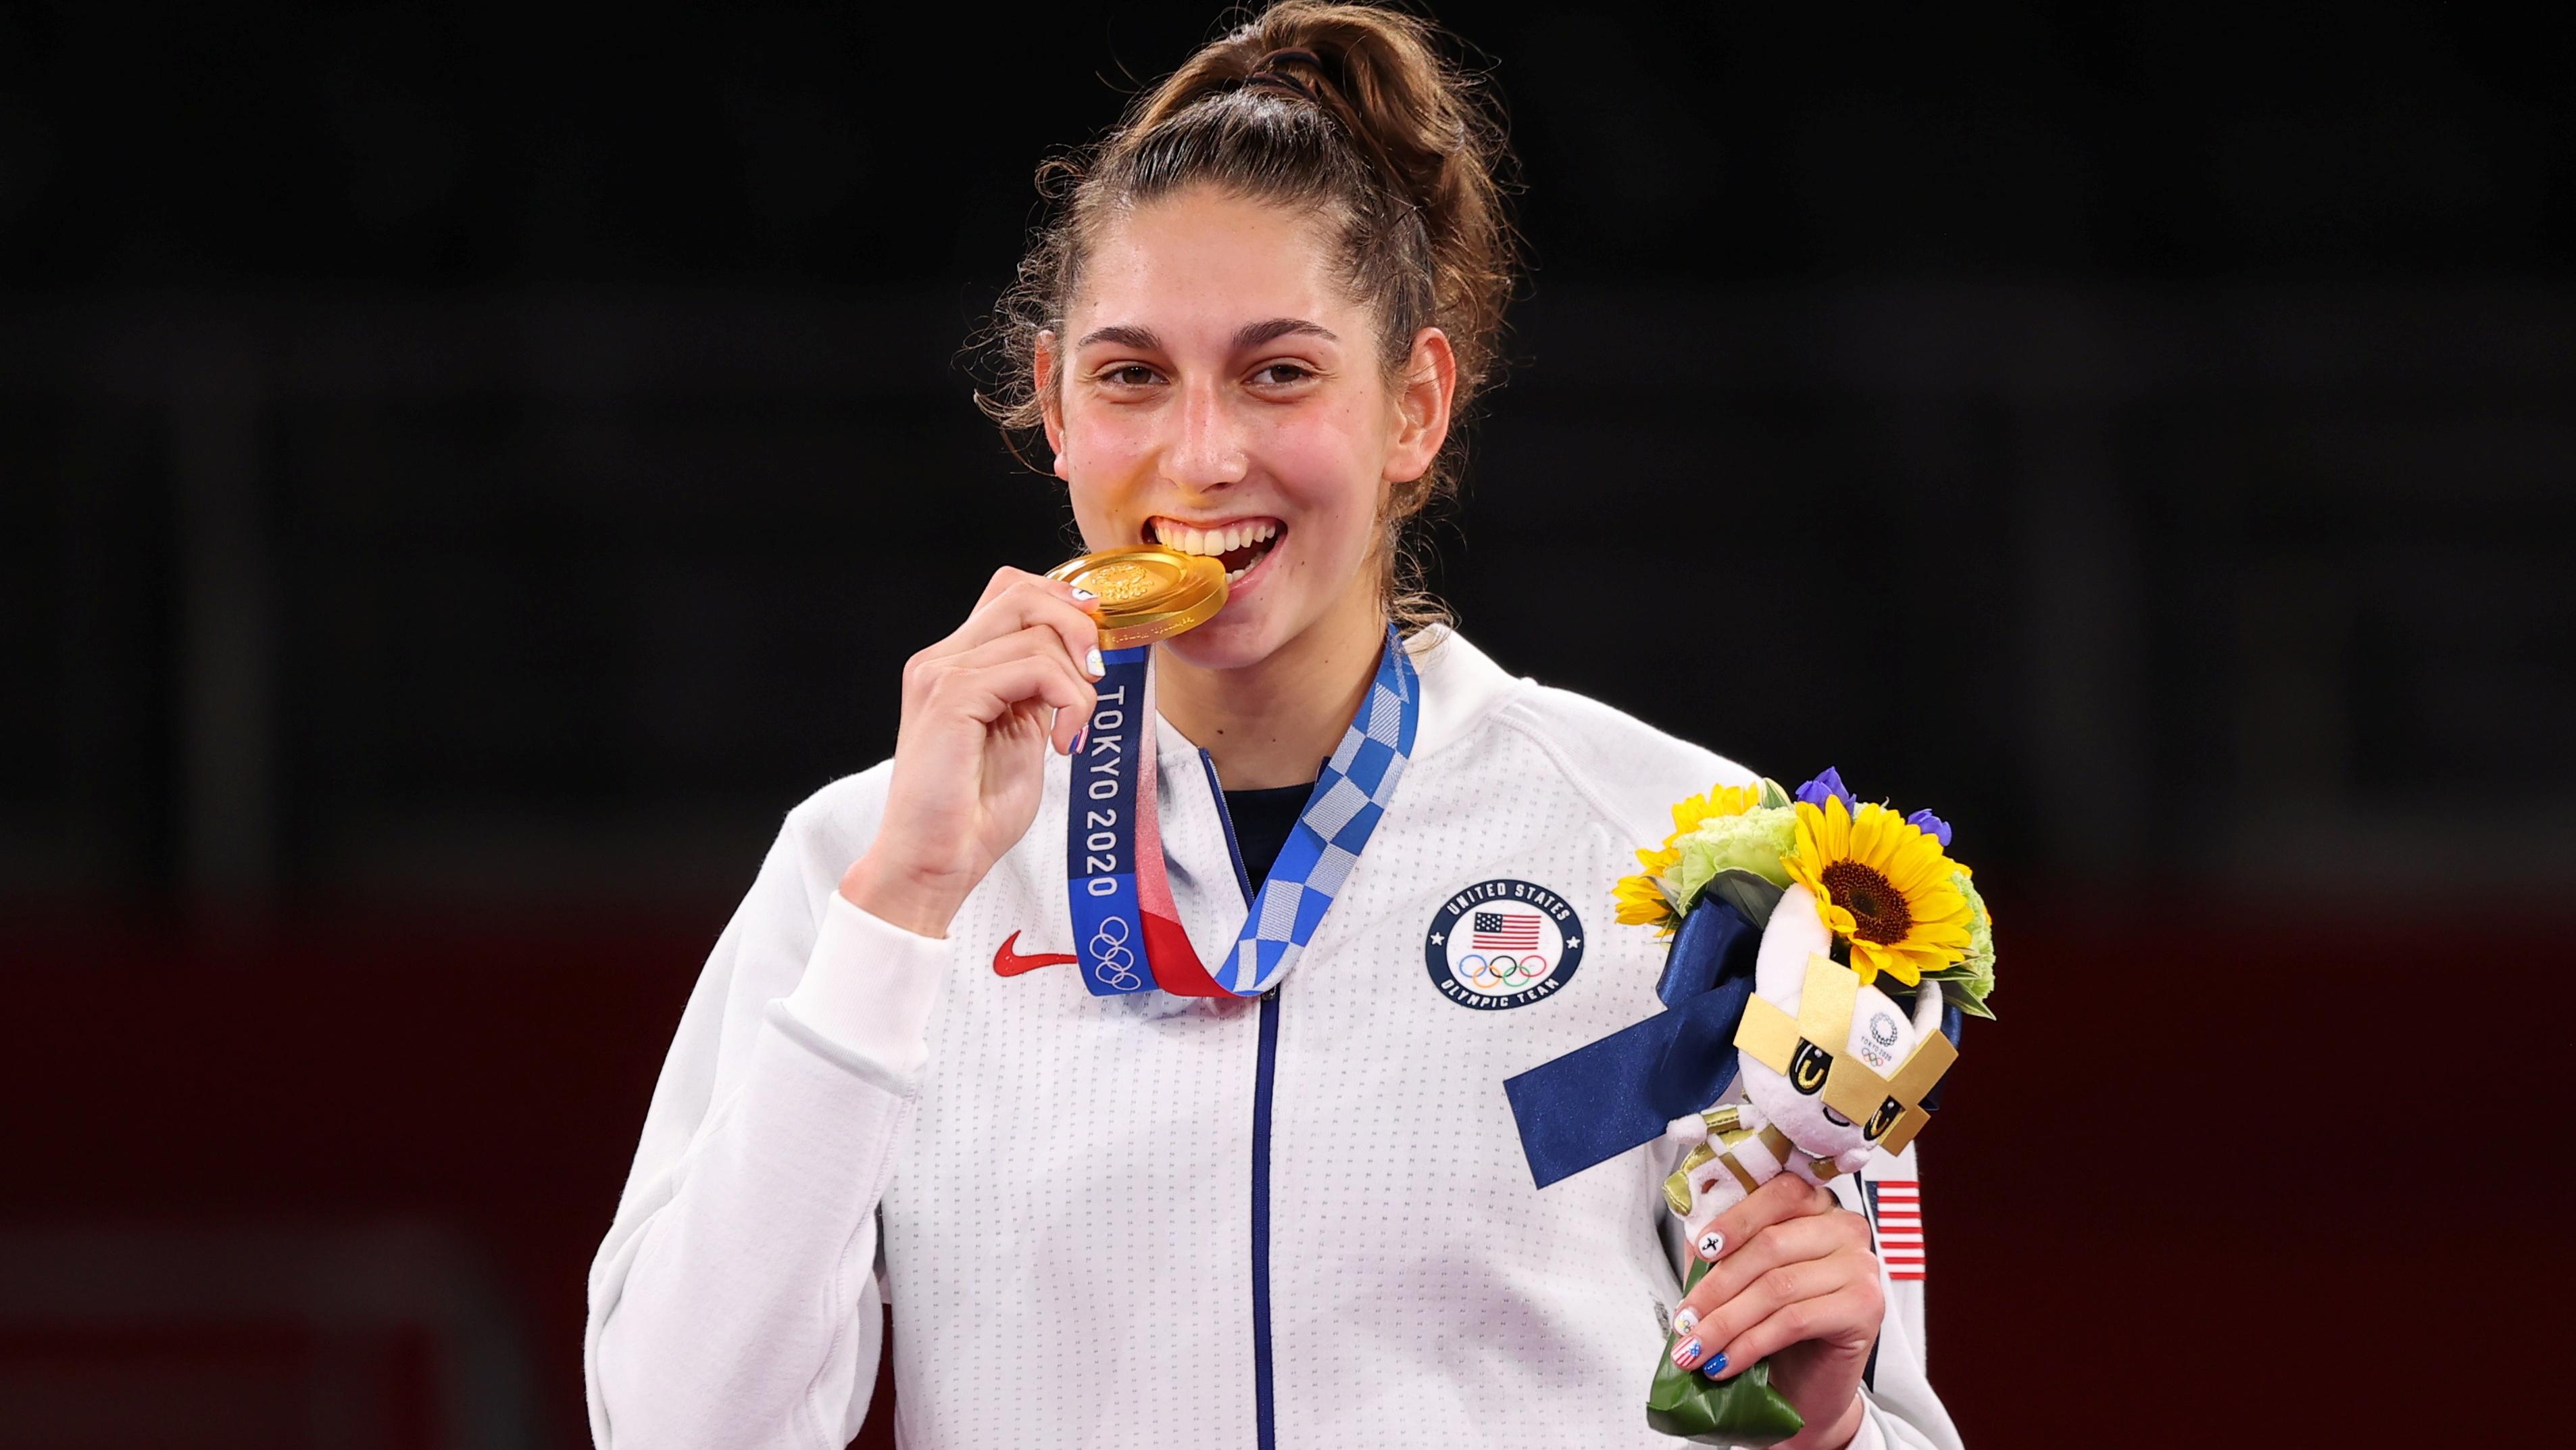 Tokyo 2020 Olympics - Taekwondo - Women's Featherweight 49-57kg - Medal Ceremony - Makuhari Messe Hall A, Chiba, Japan - July 25, 2021. Anastasija Zolotic of the United States celebrates winning gold REUTERS/Murad Sezer